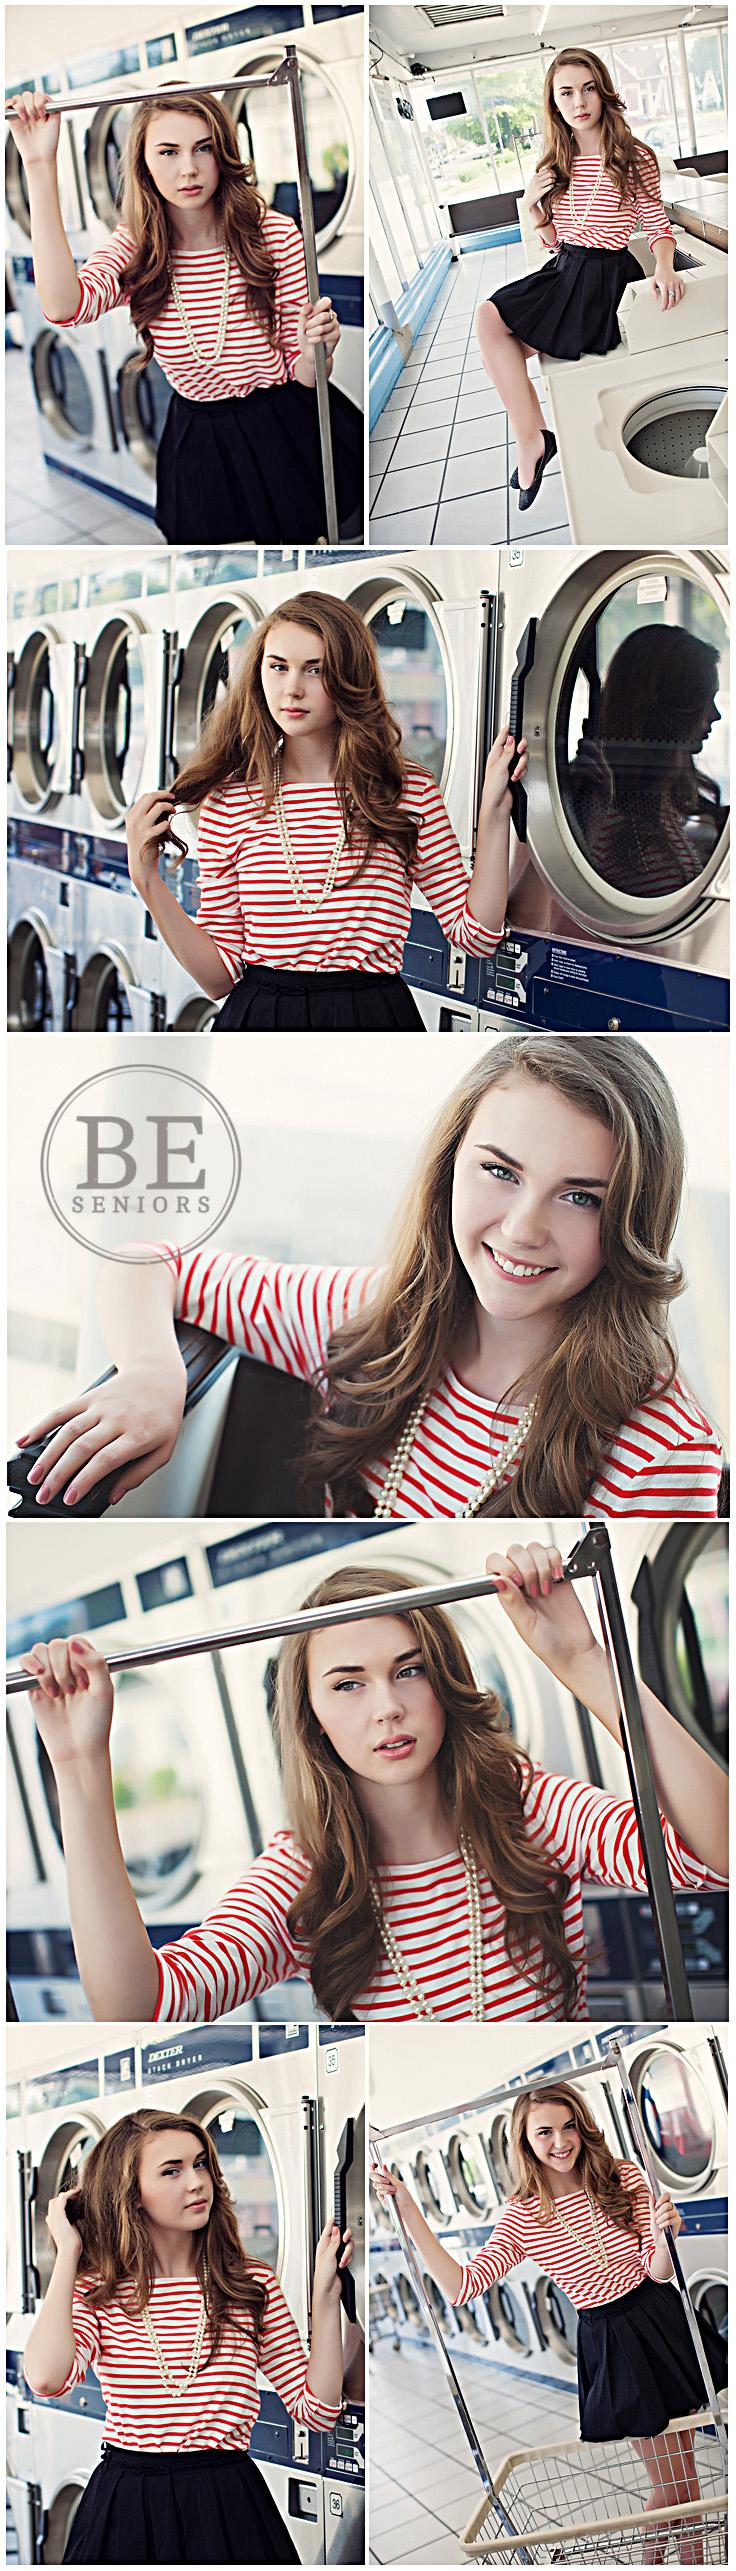 B.E. Senior - Taylor - vintage inspiration